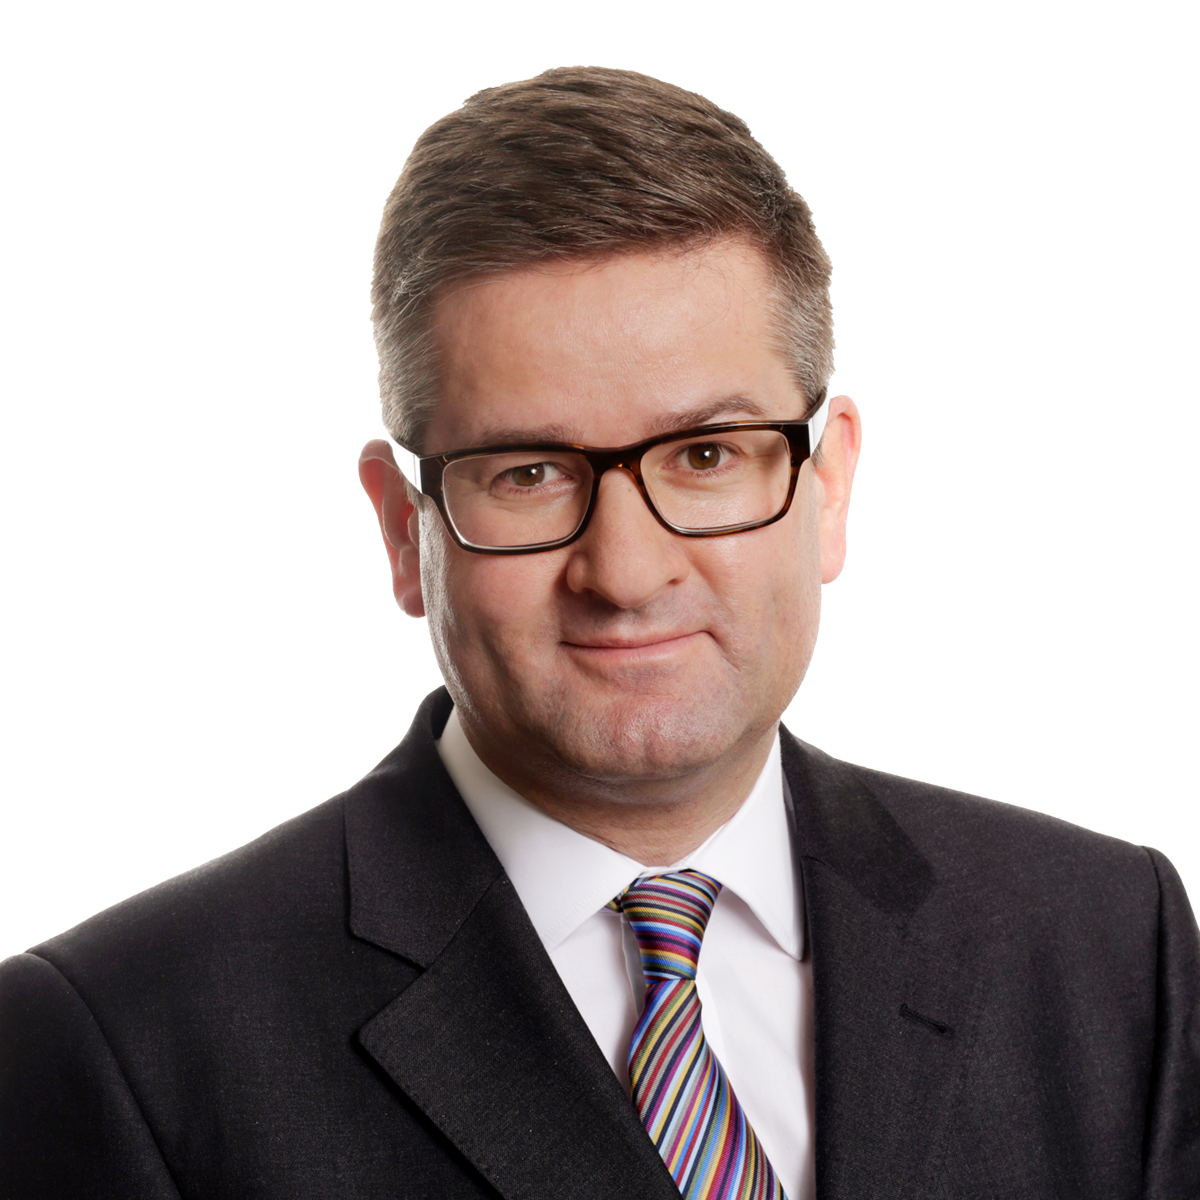 Michael Salcher